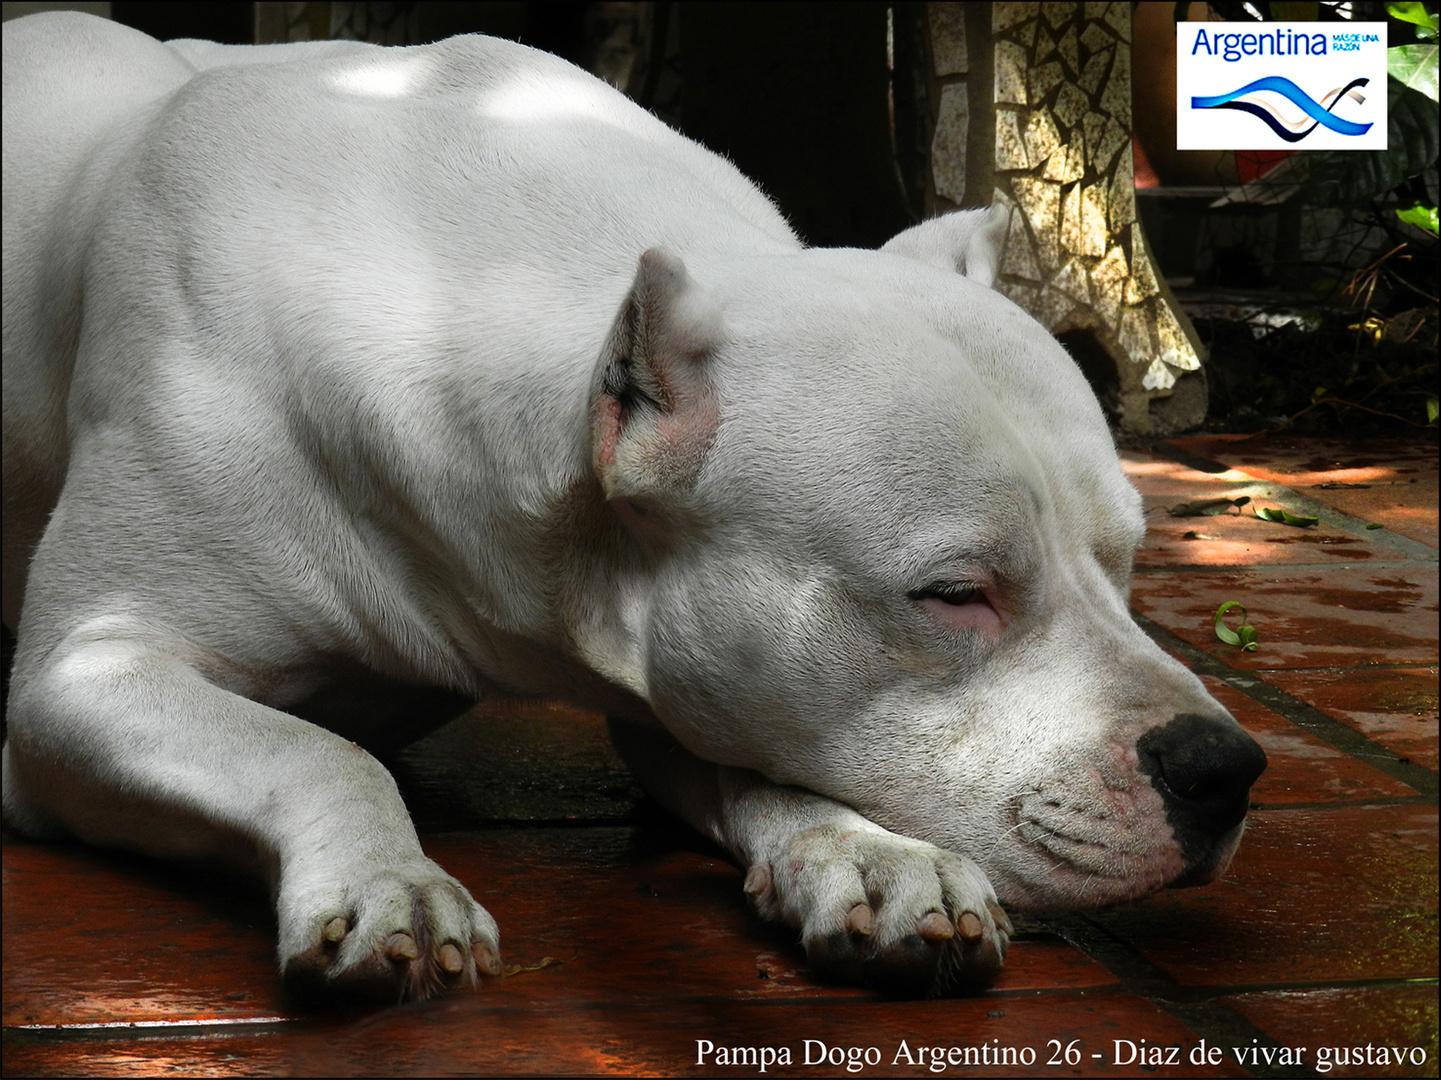 Pampa Dogo Argentino 26 - Diaz de vivar gustavo